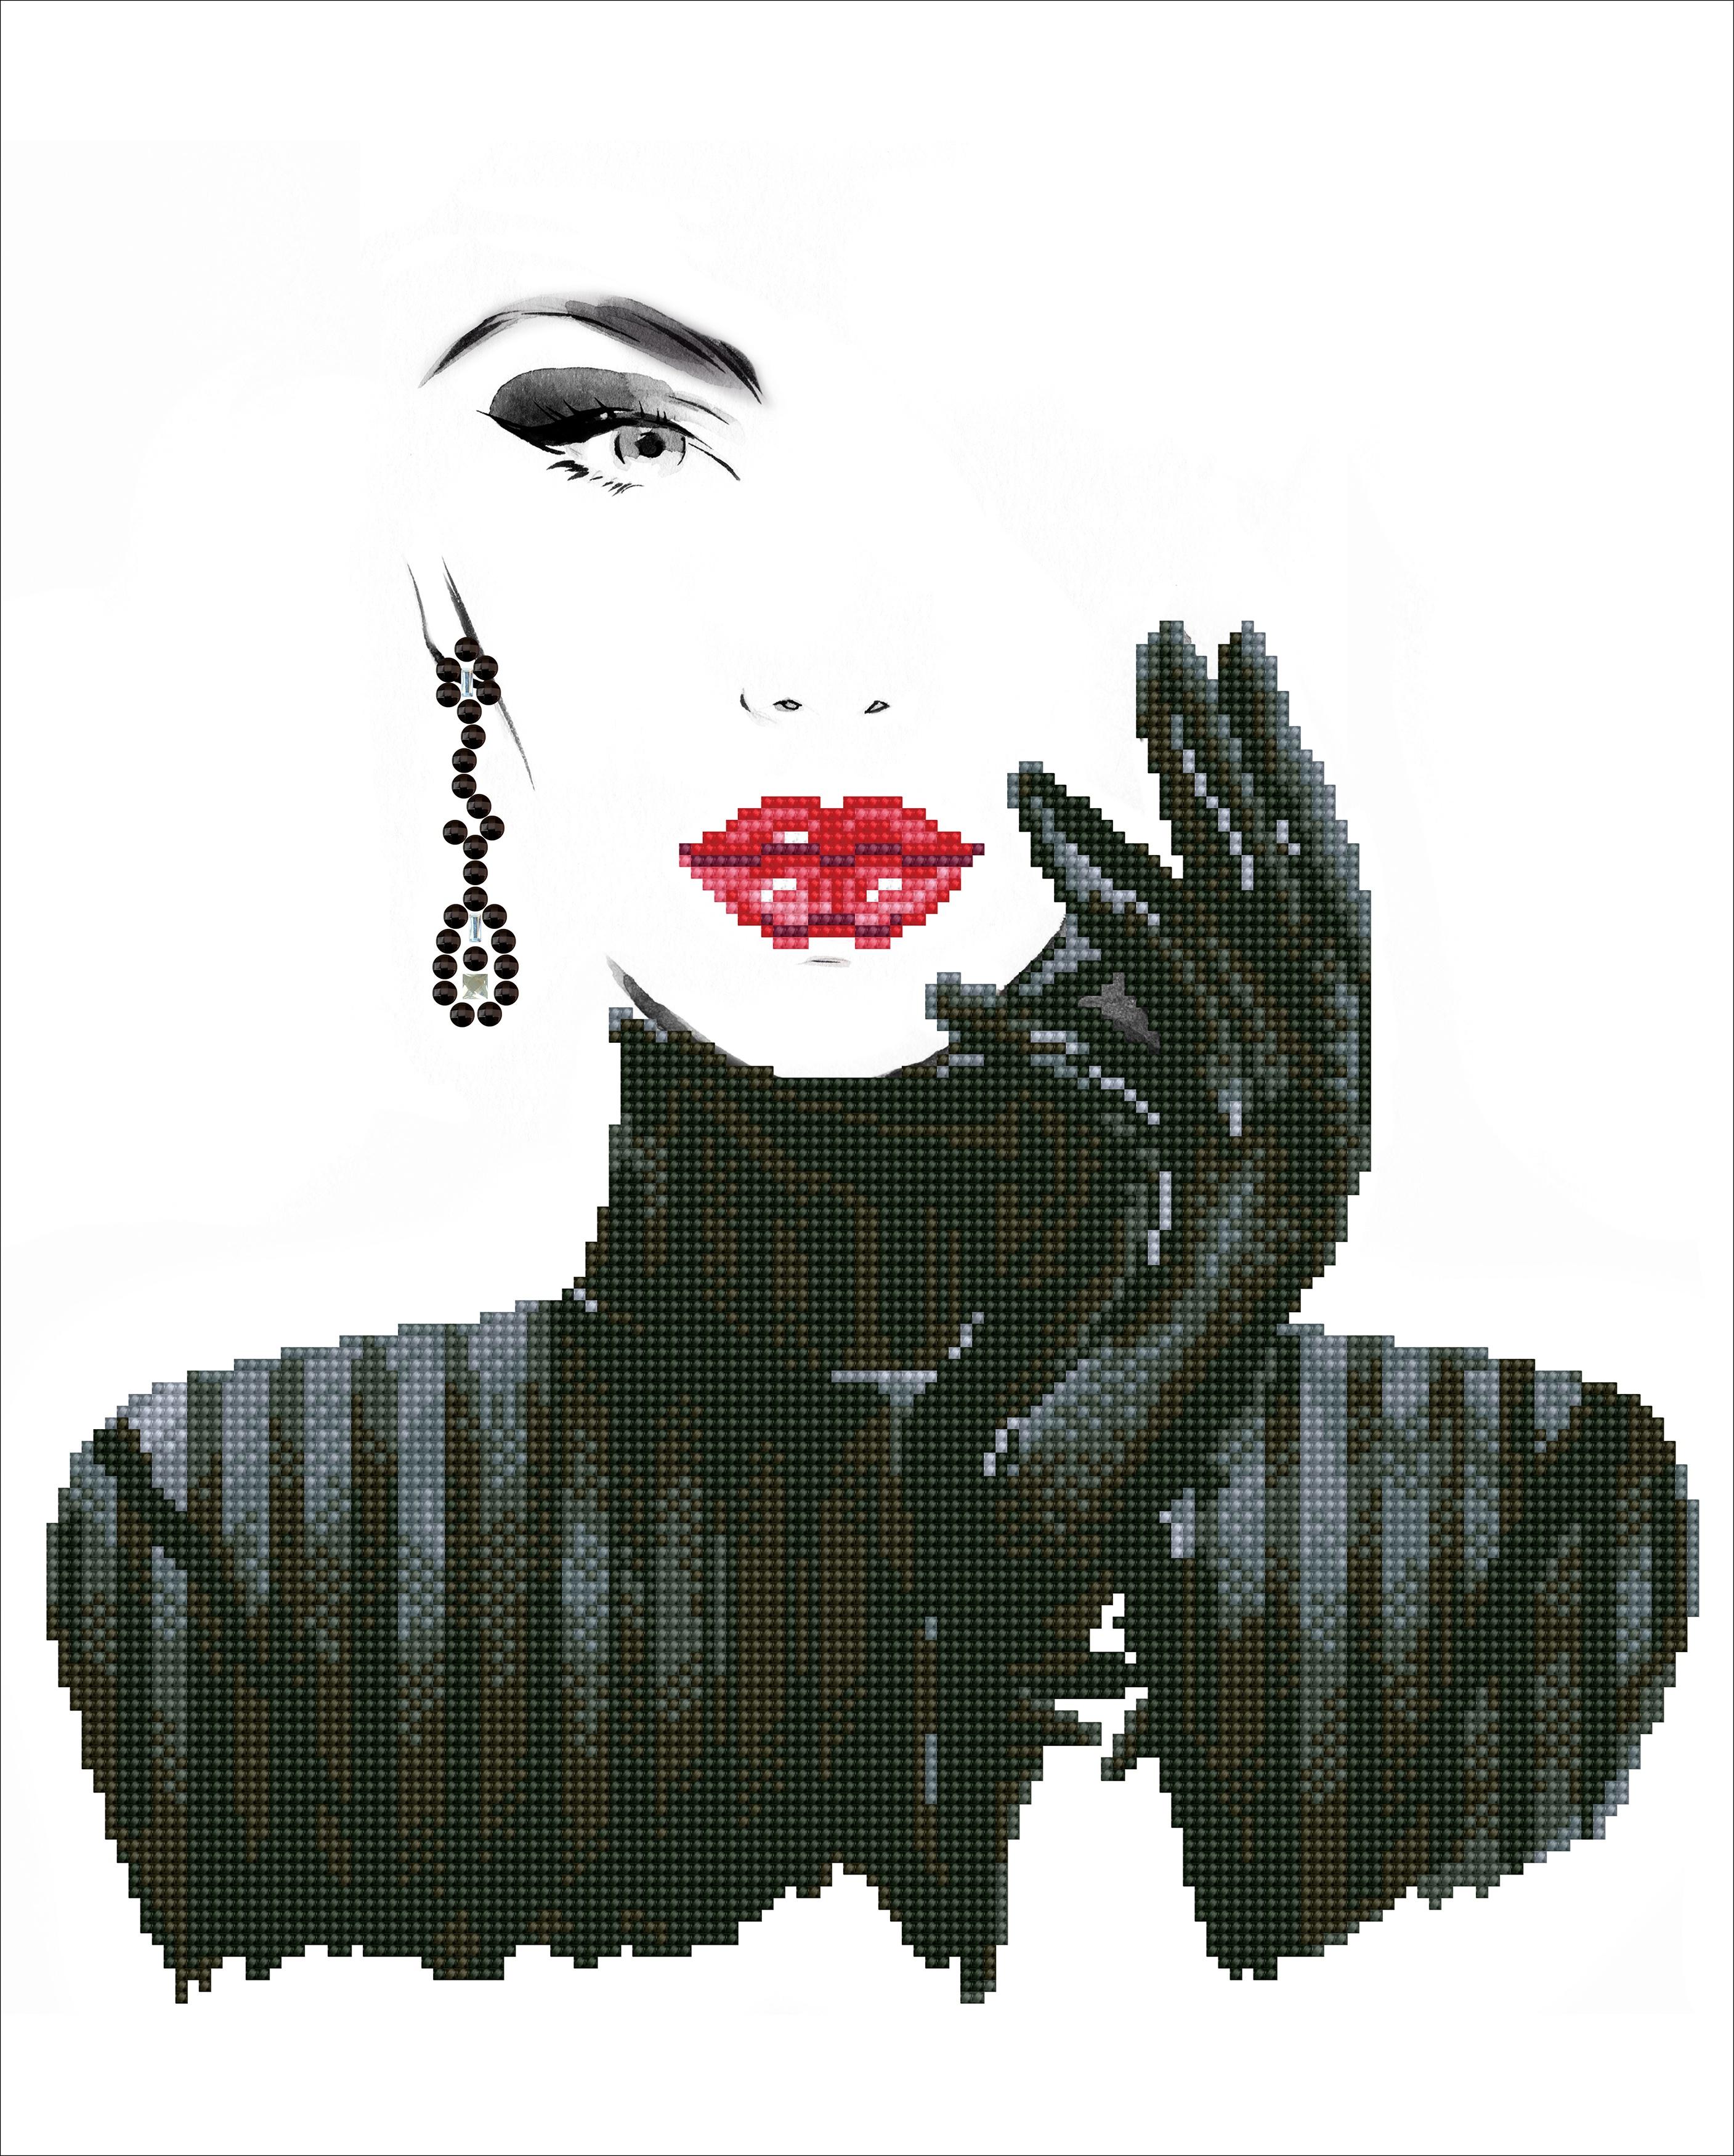 Diamond Dotz Diamond Embroidery Facet Art Kit 16.5X20.5-Lady In Black